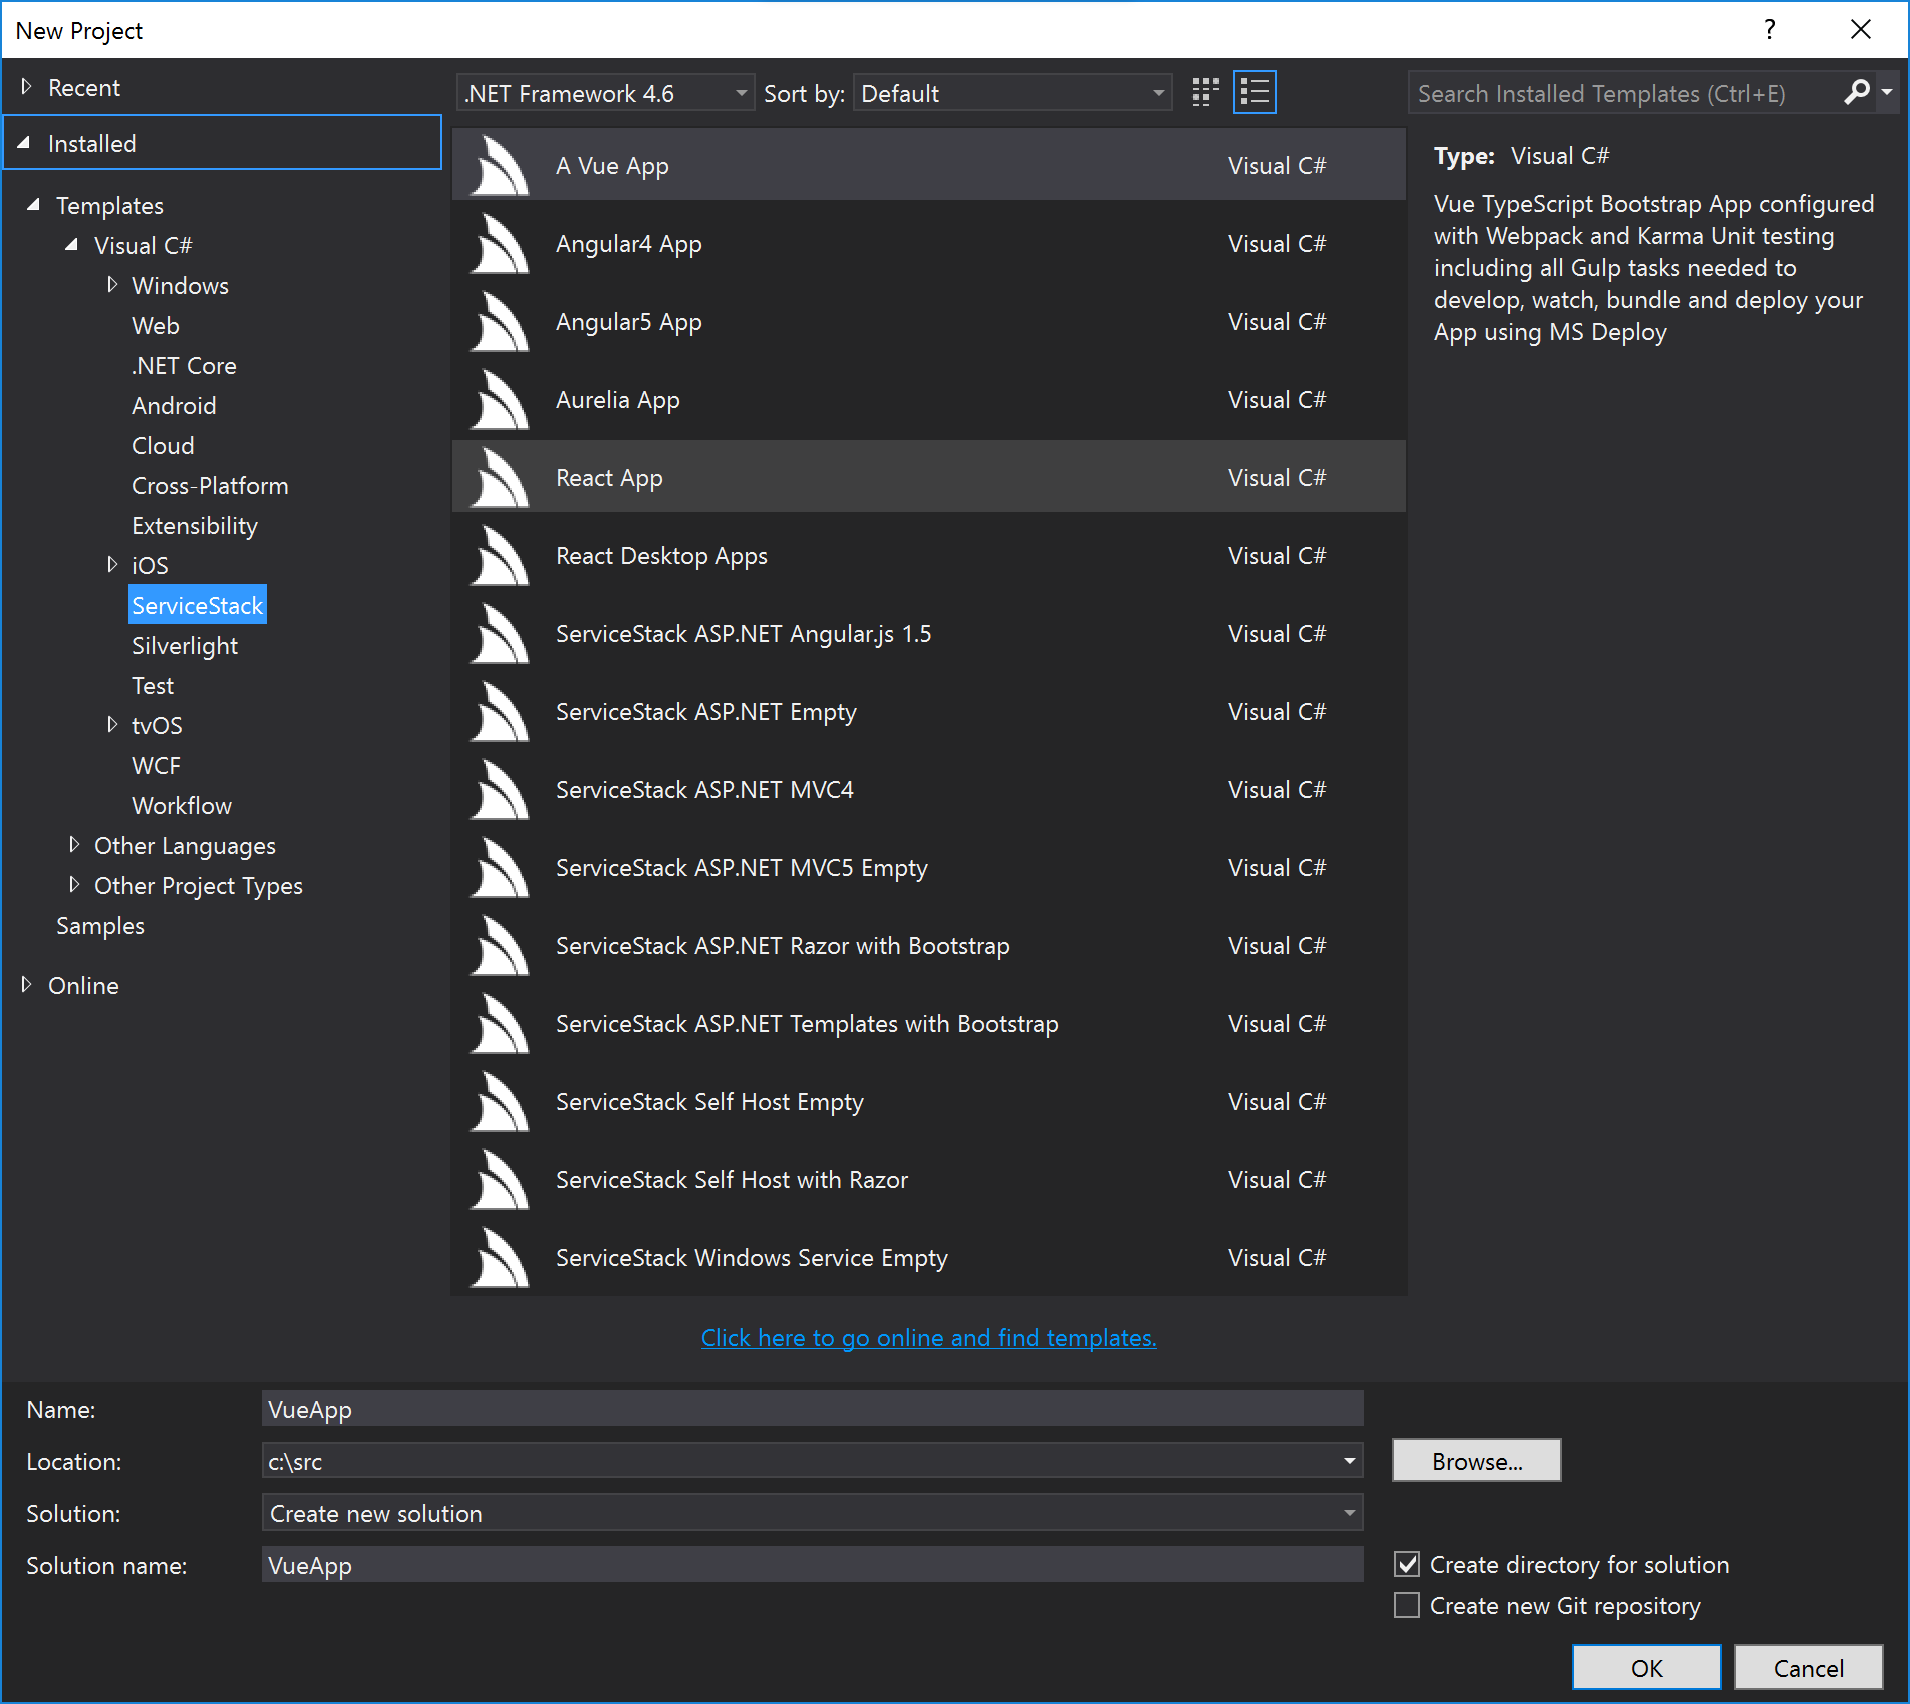 ServiceStack VS.NET Templates Dialog